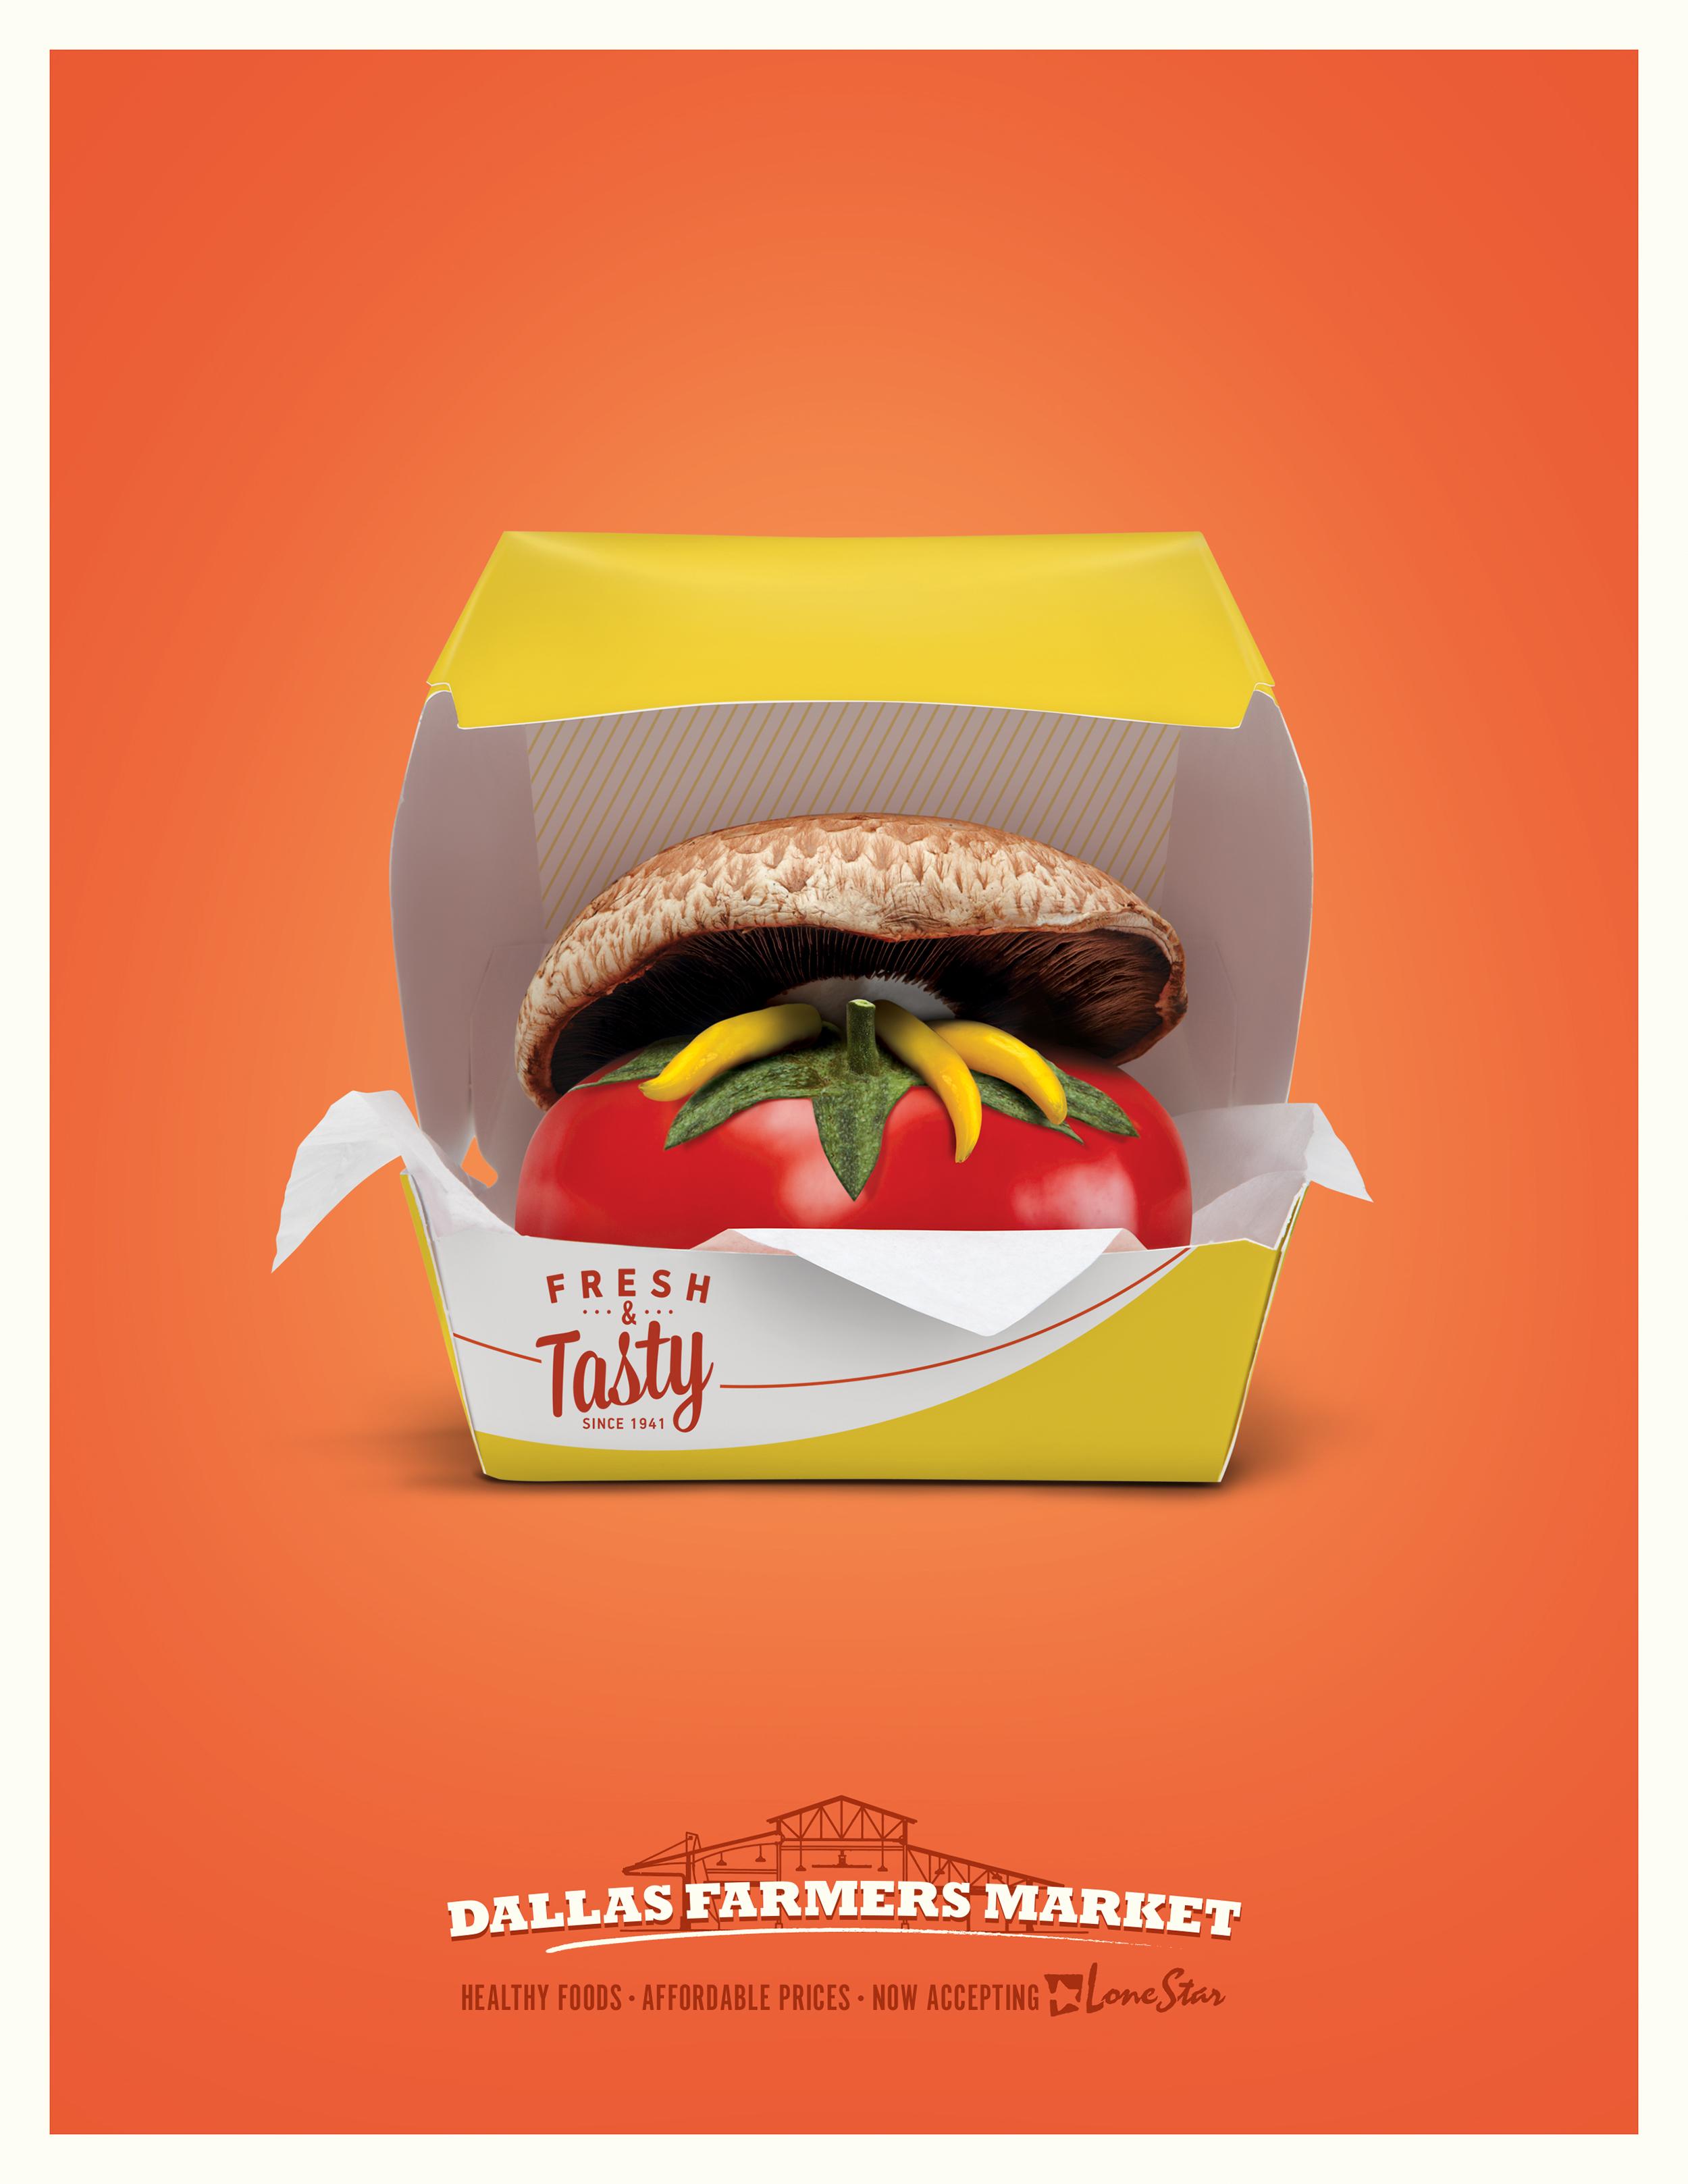 ryan-smith-creative-director-dallas-farmers-market-burger